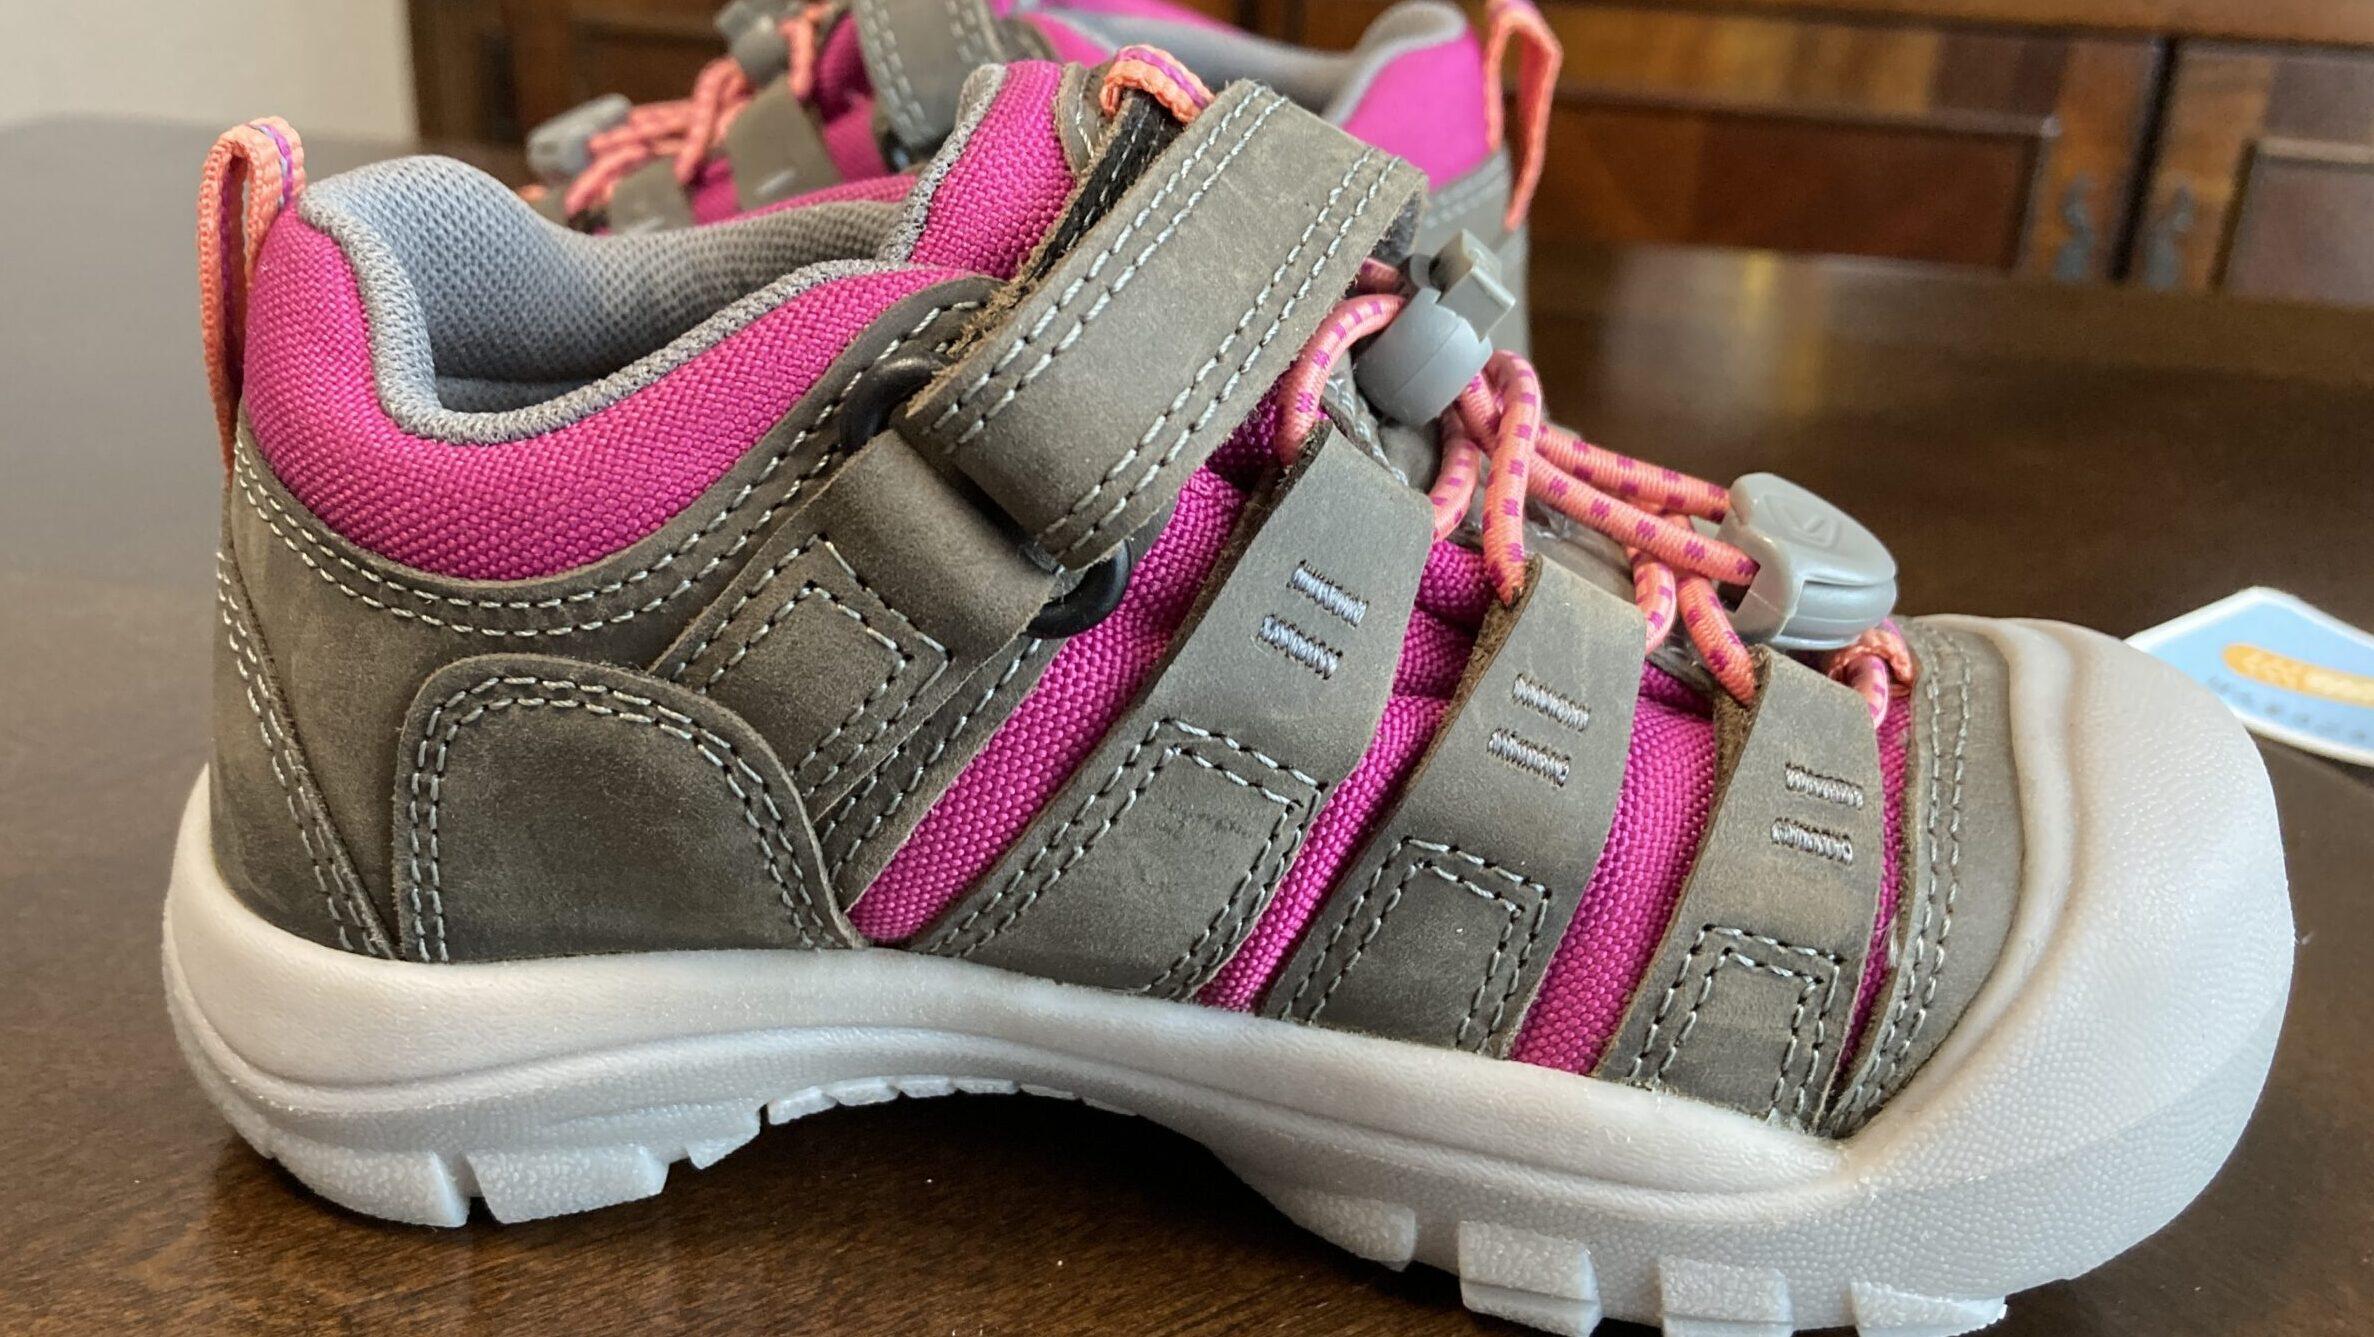 KEEN(キーン)のキッズの靴(スニーカー)ってどう?サイズ感は?防水は?など徹底調査!【ニューポートシューズのレビュー記事】のイメージ画像11